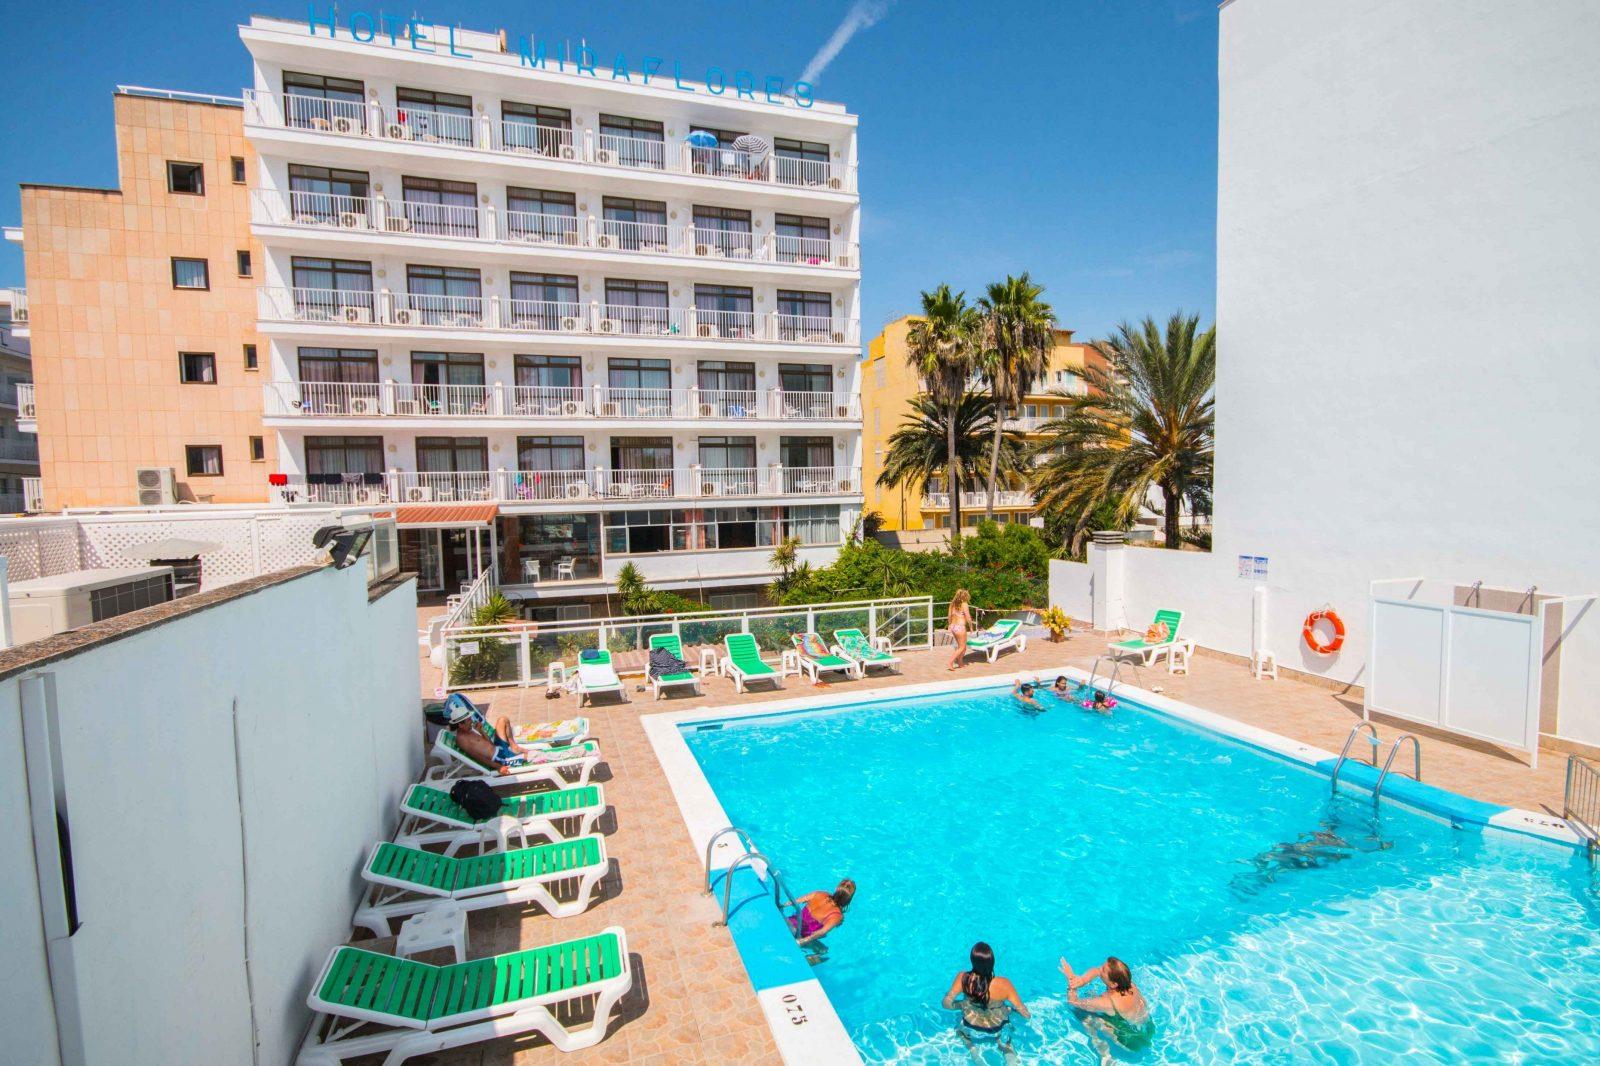 Hotel Amic Miraflores ***  Amic Hotels Majorca  Booking 08435 von Hotel Playa In Can Pastilla Bild